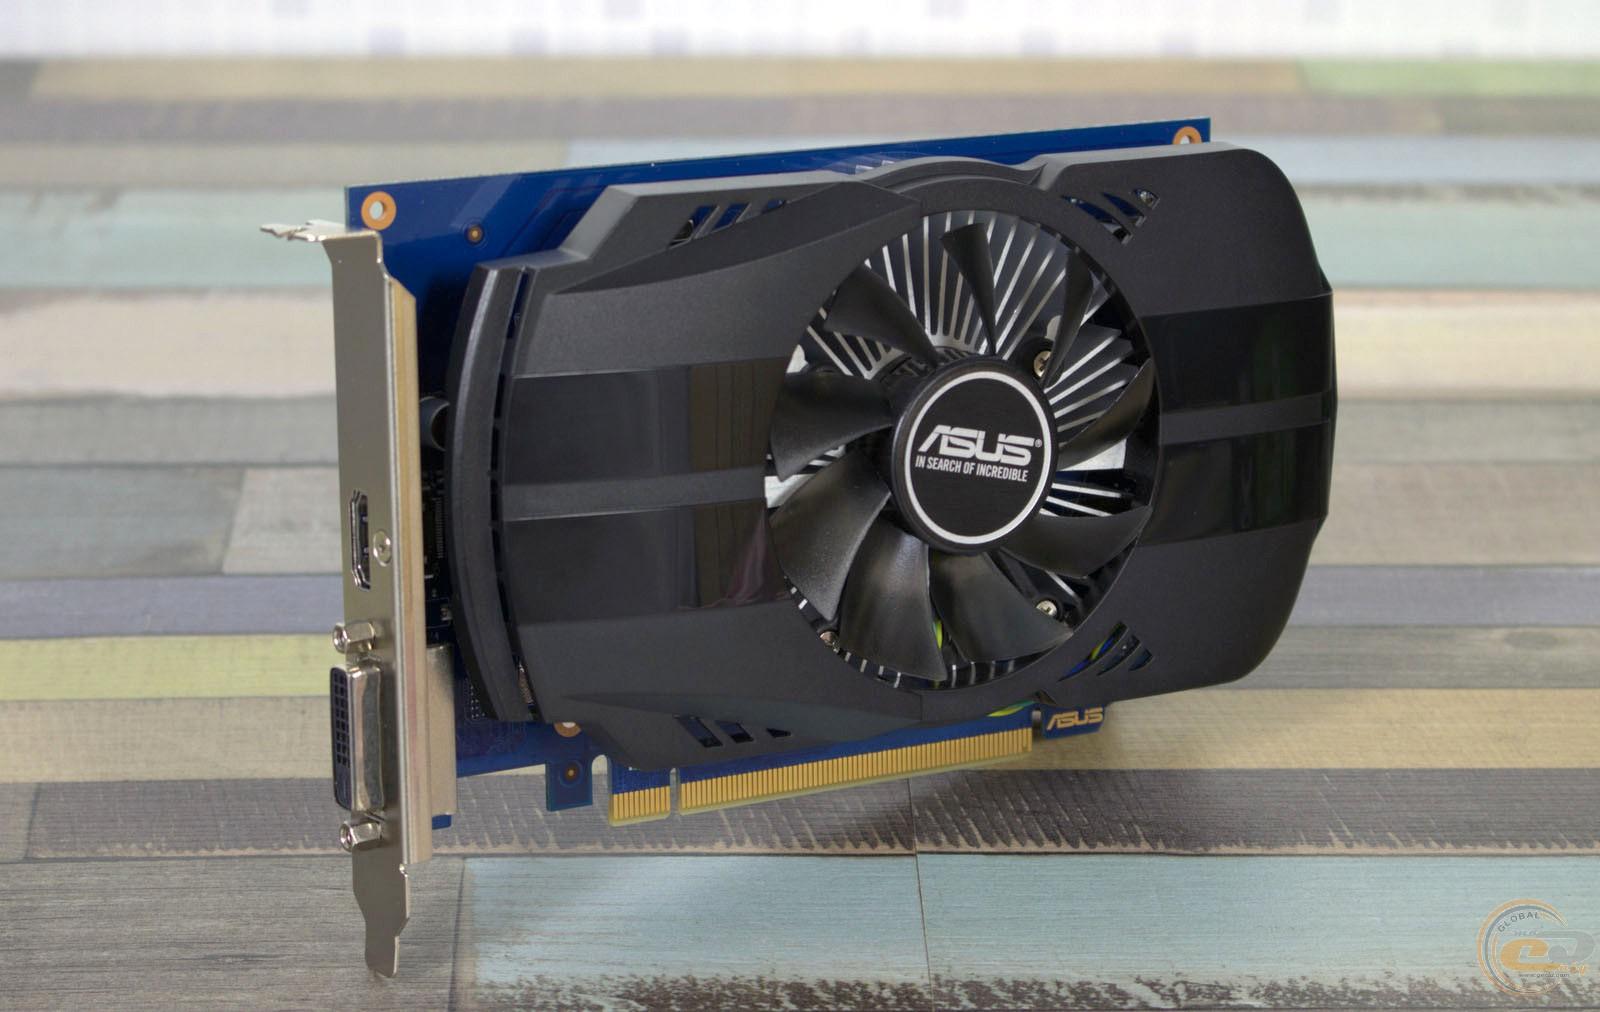 ASUS Phoenix GeForce GT 1030 OC edition (PH-GT1030-O2G)